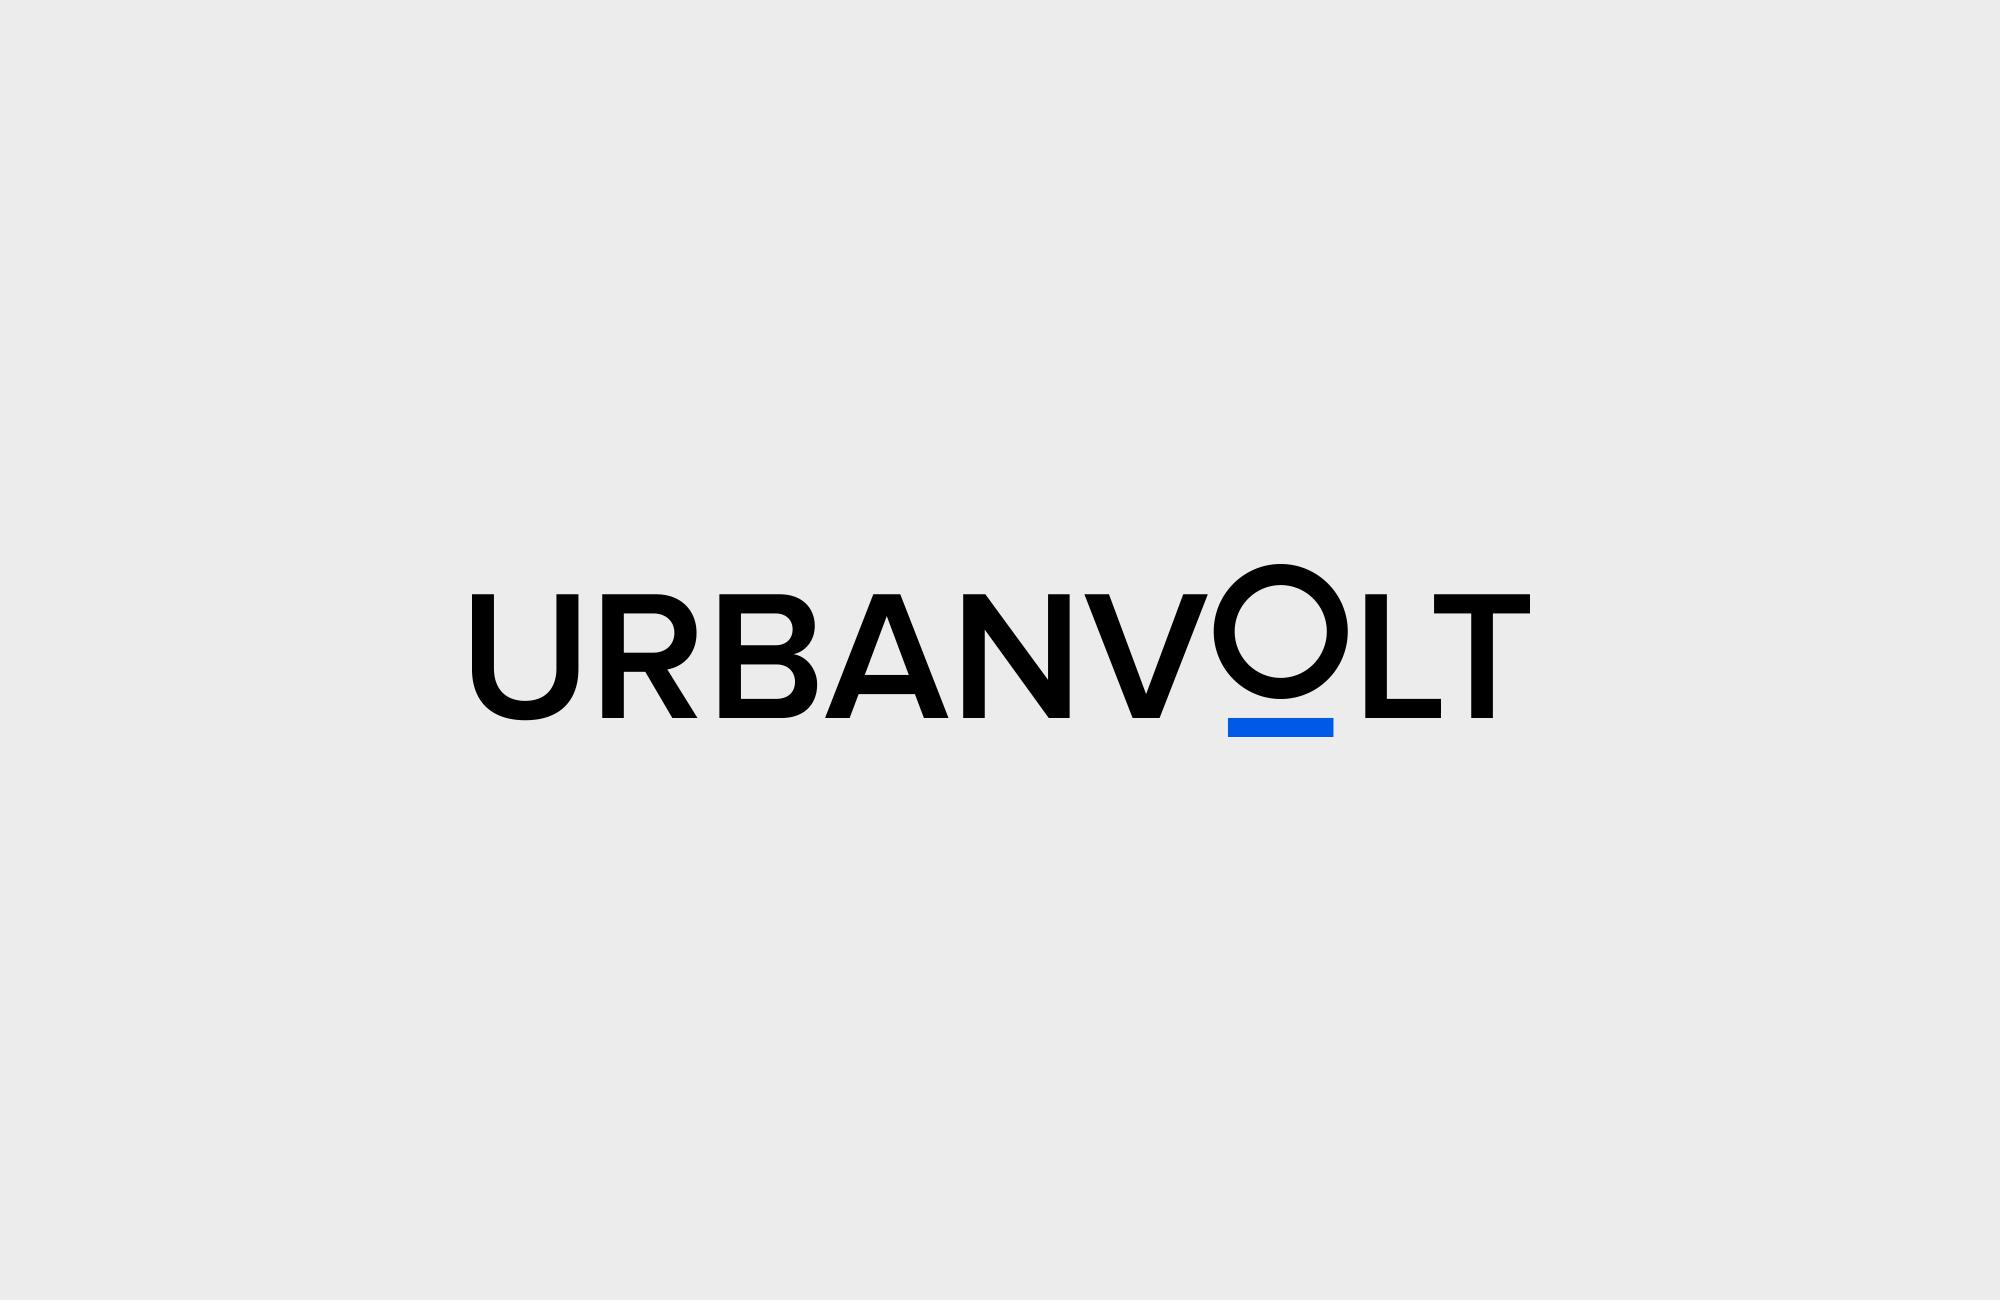 Cover image: UrbanVolt